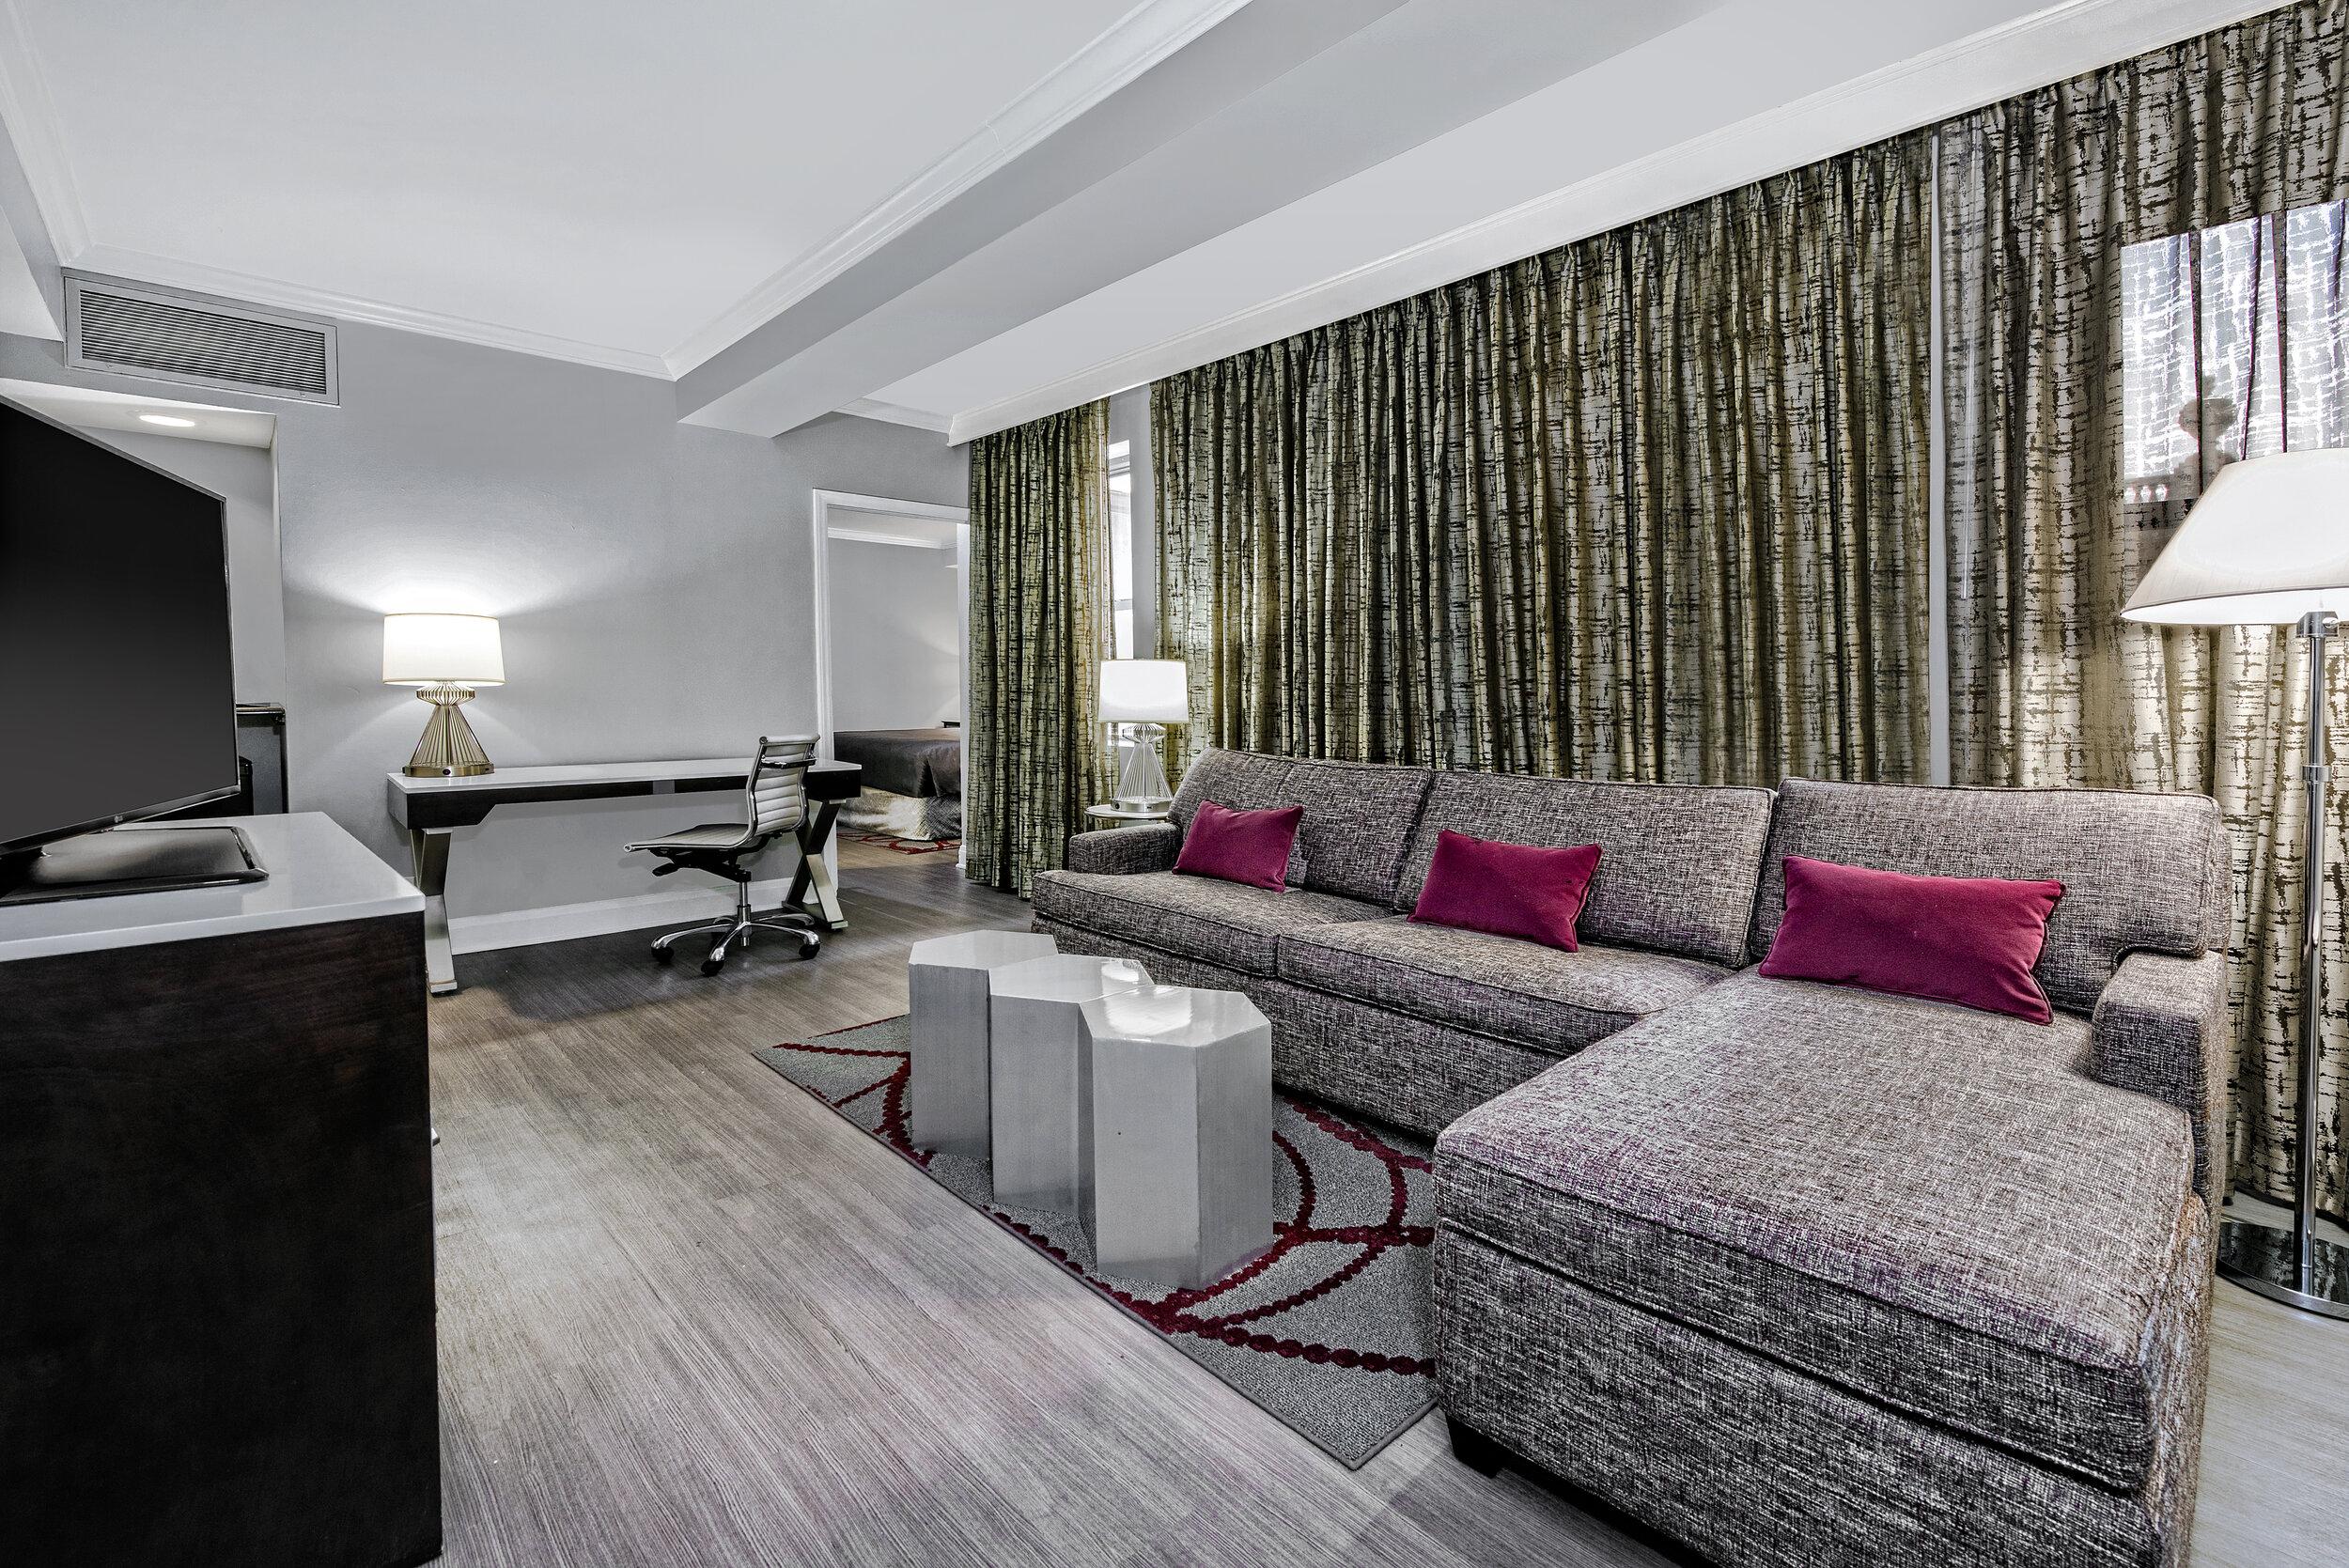 dalar-hotel-indigo-dallas-downtown-king-suite-living-area-rm1113.jpg